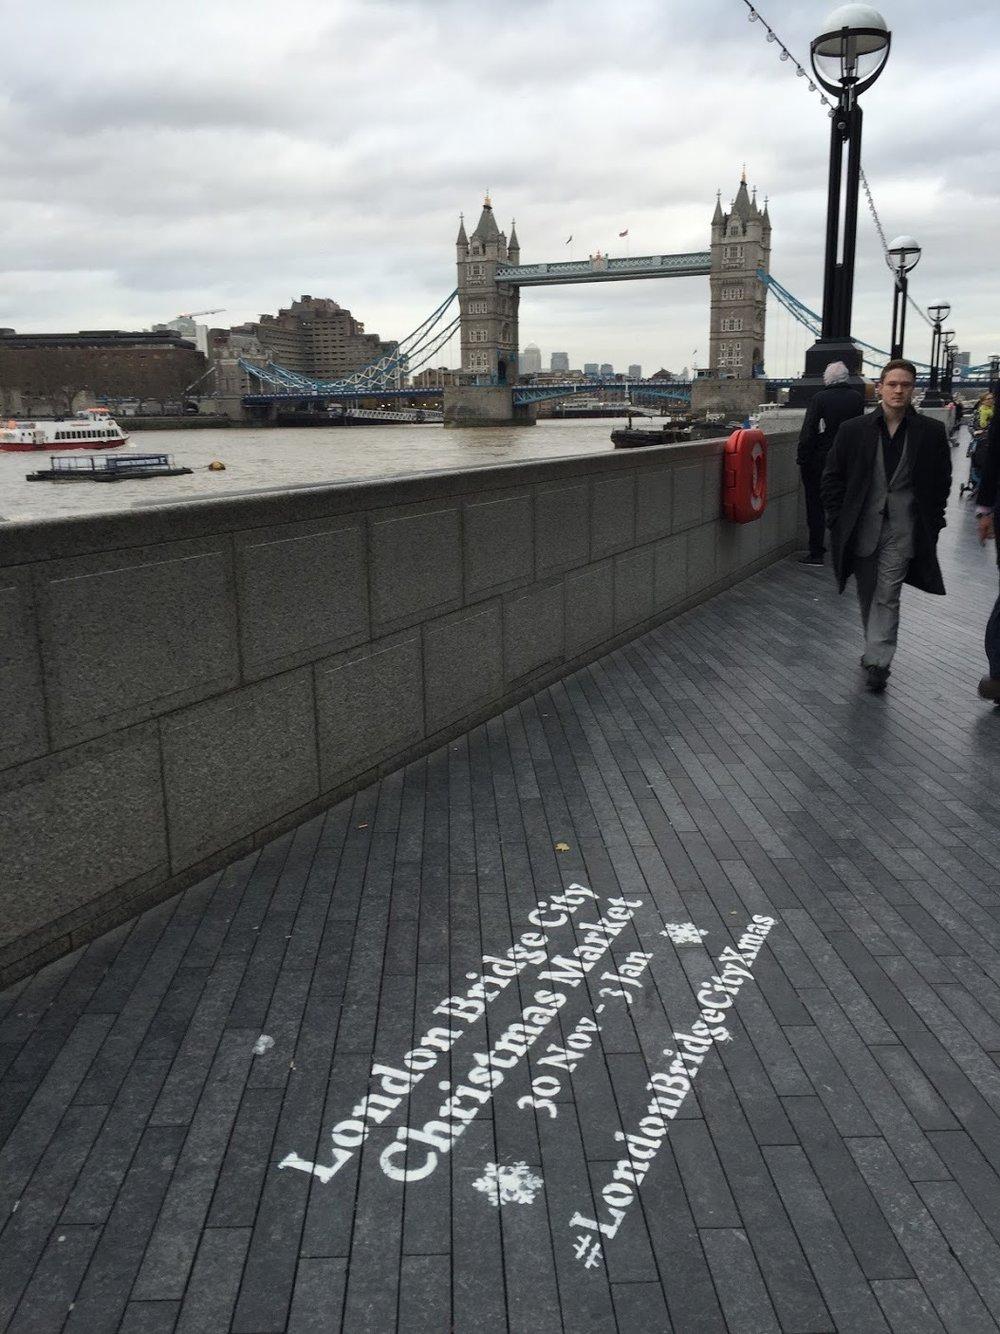 Floor Stencils Markets London